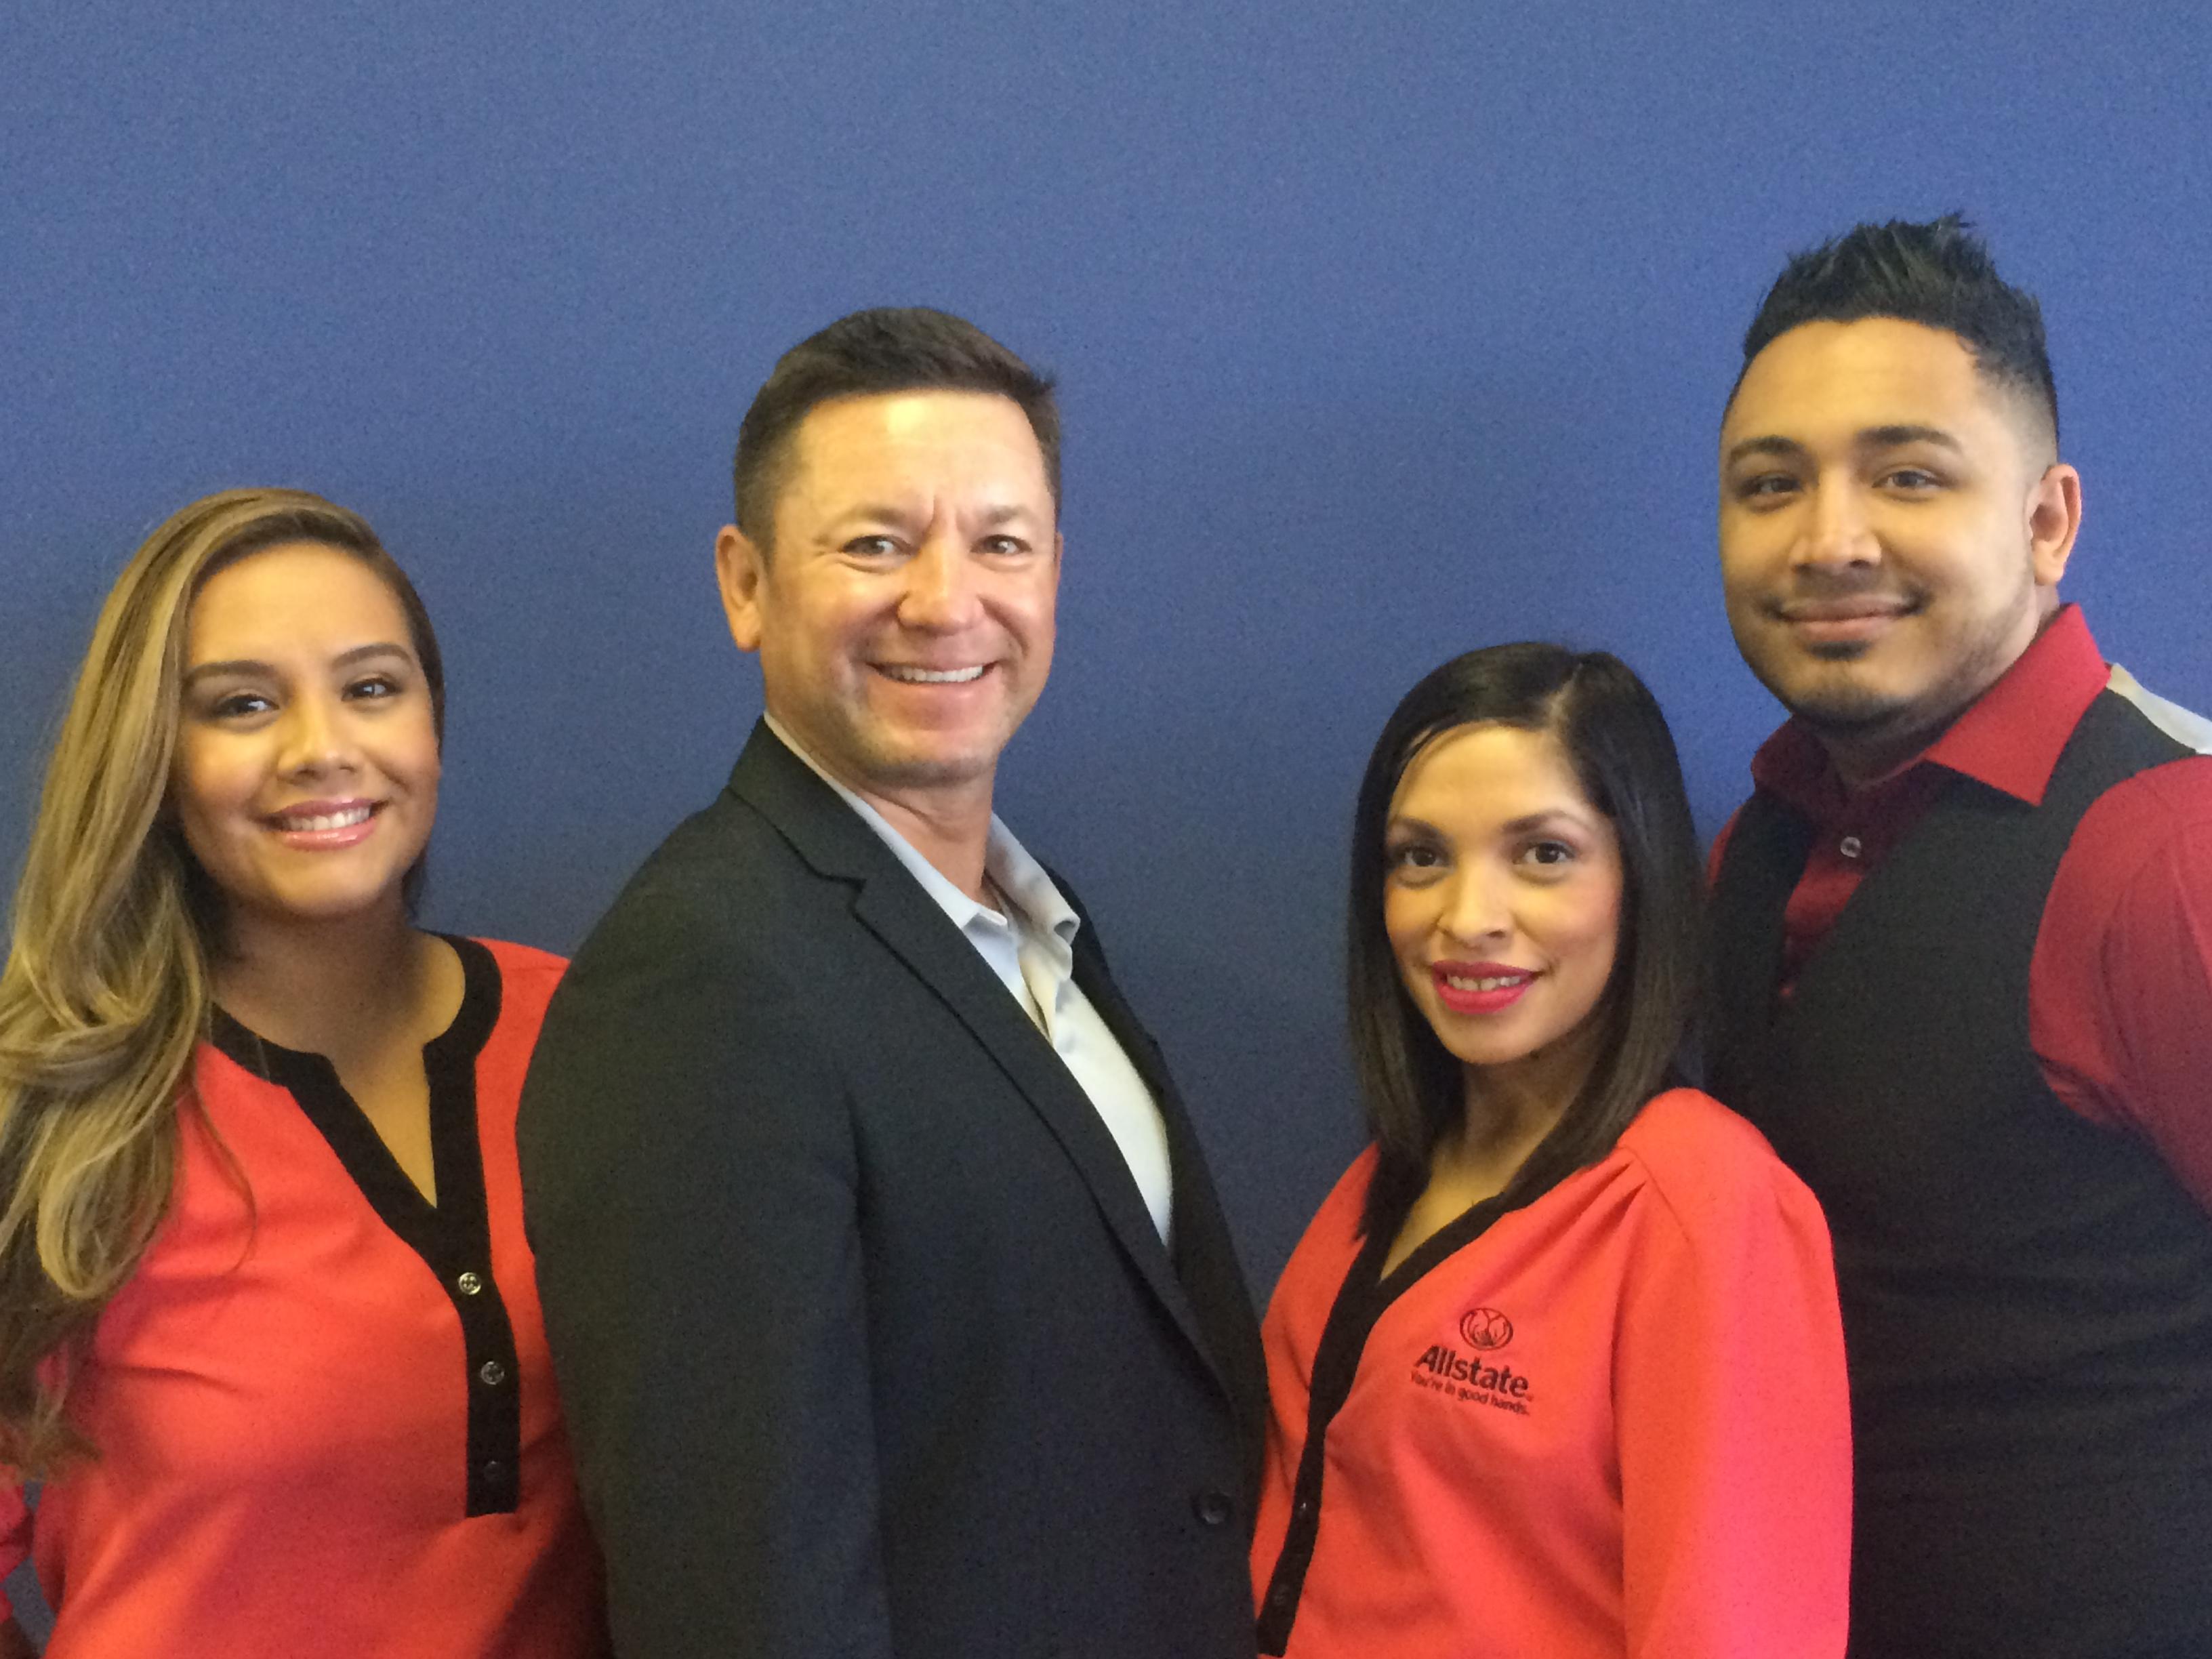 Omar Salazar: Allstate Insurance image 1